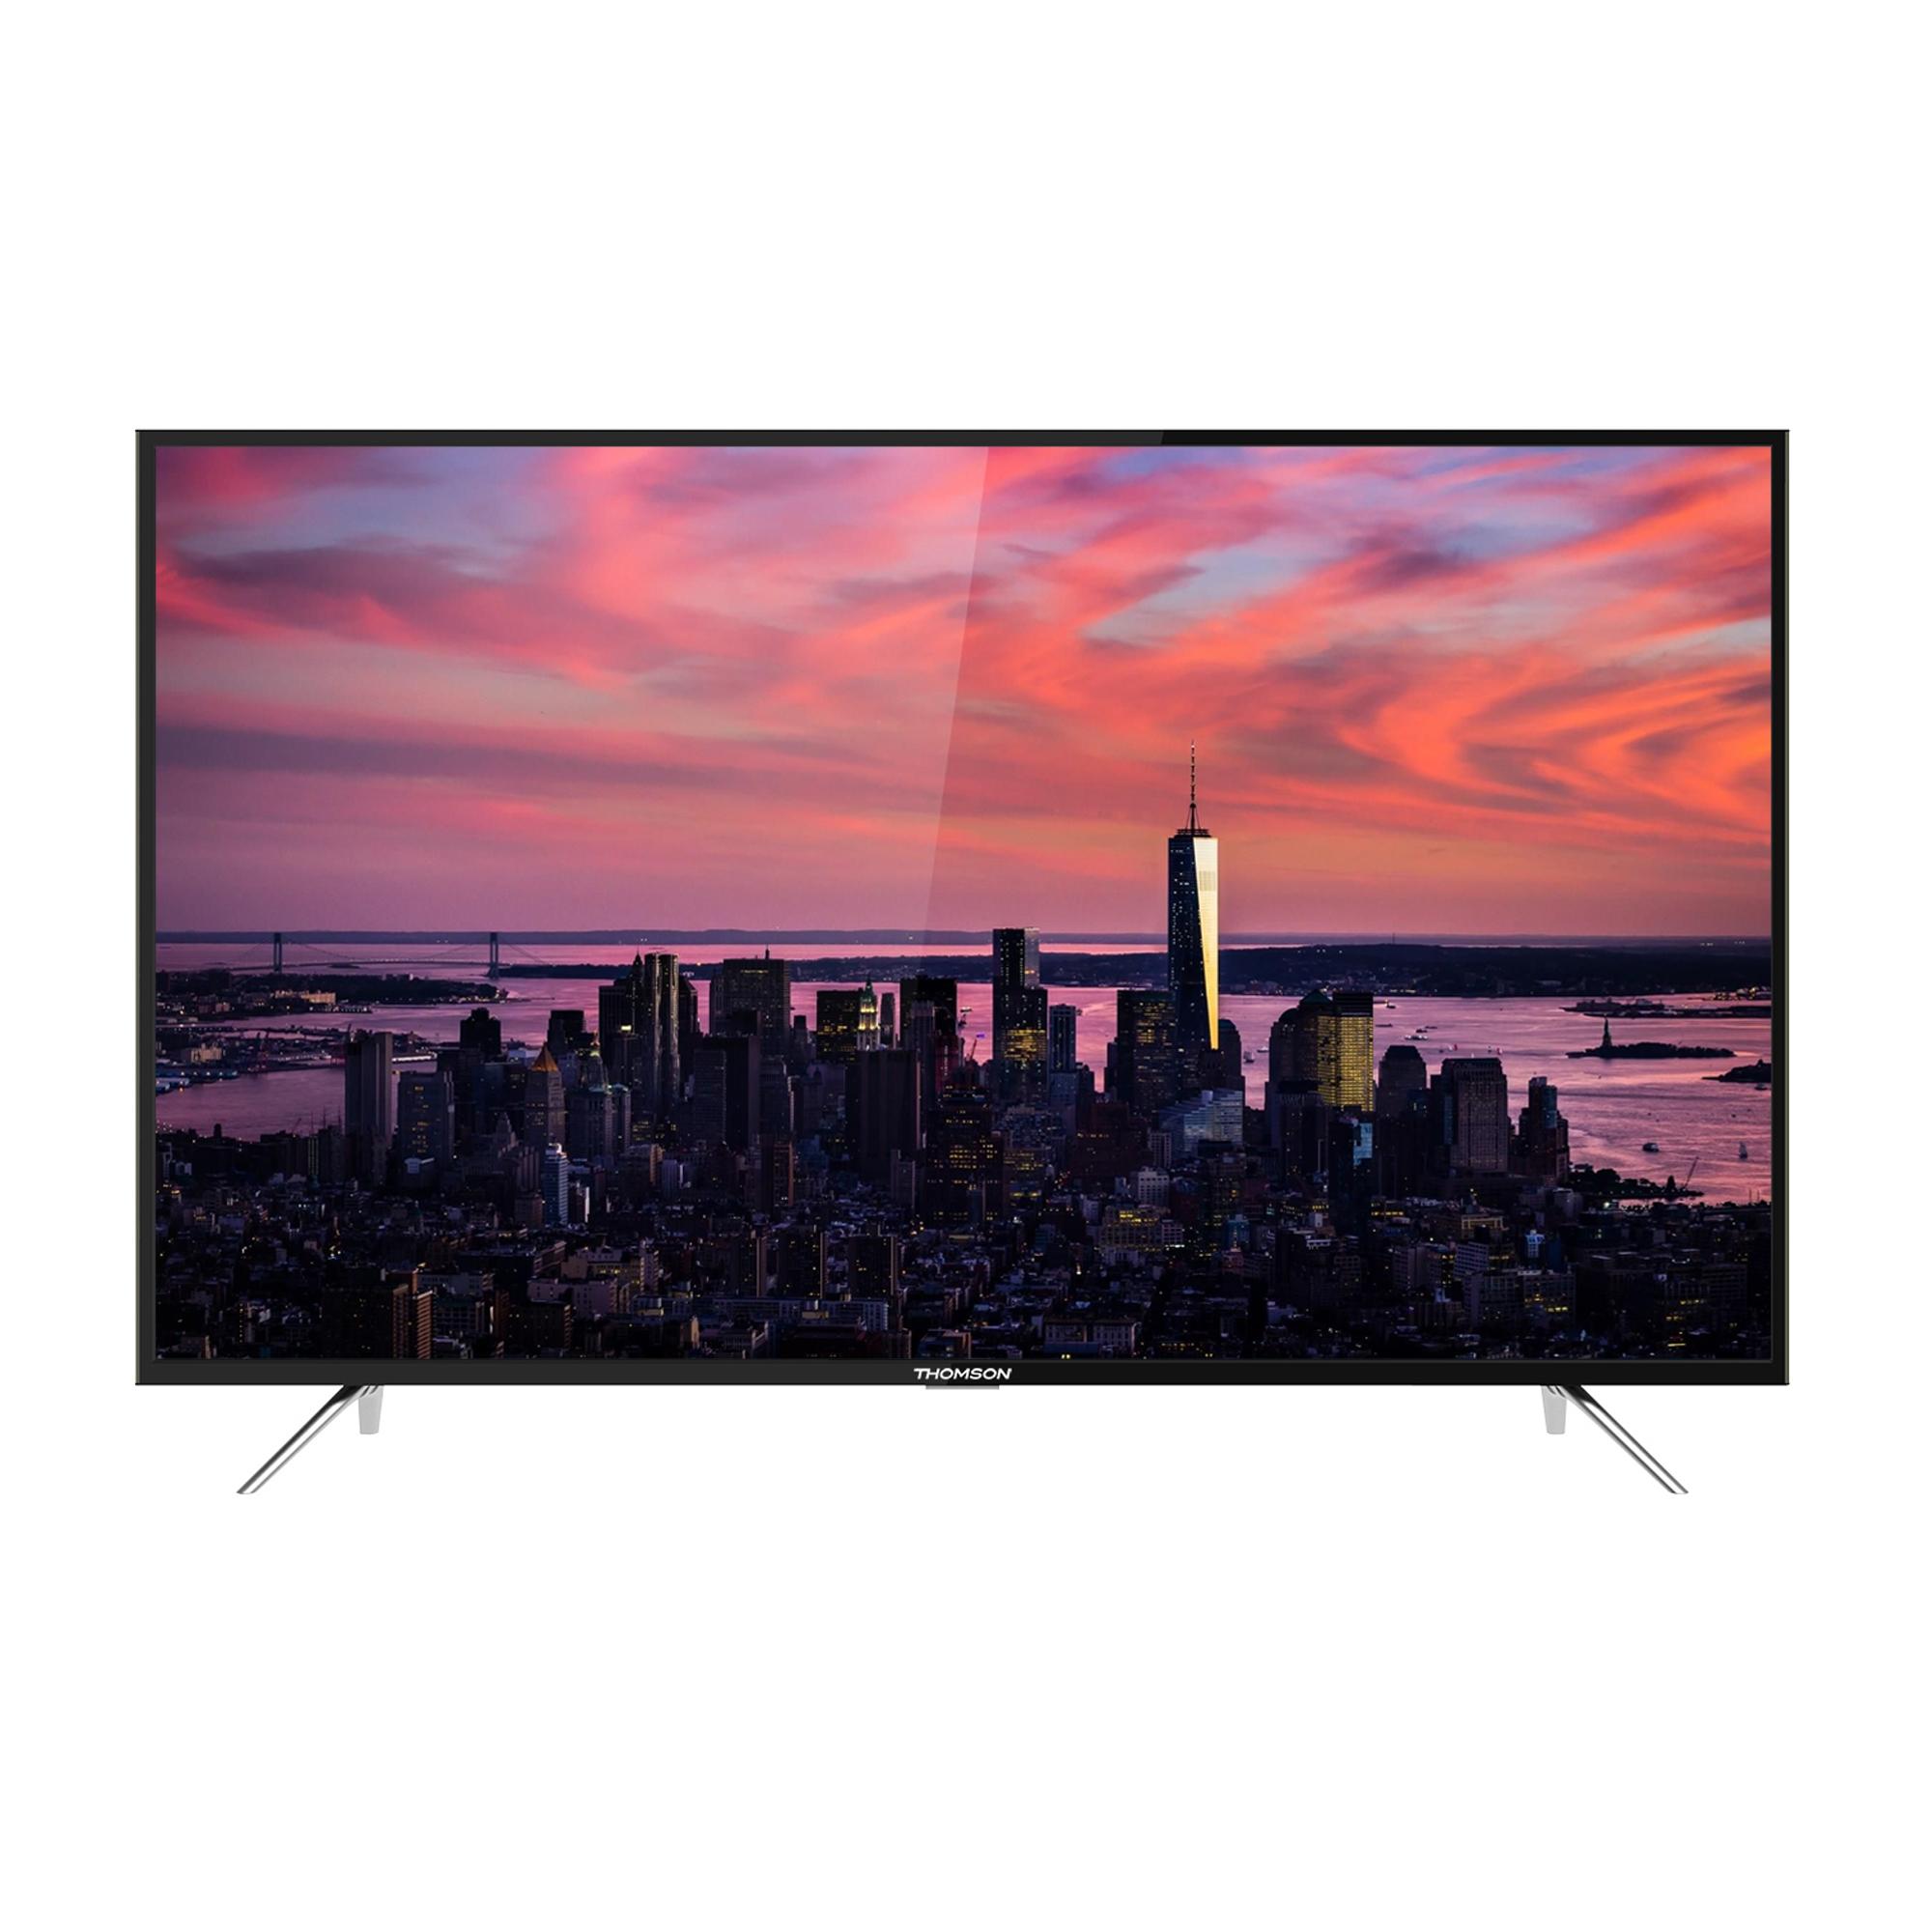 Thomson 55 UC6306 - 139 cm (55 Zoll) Fernseher (4K Ultra HD, HDR 10, Smart TV, WLAN, Triple Tuner (DVB T2), USB)